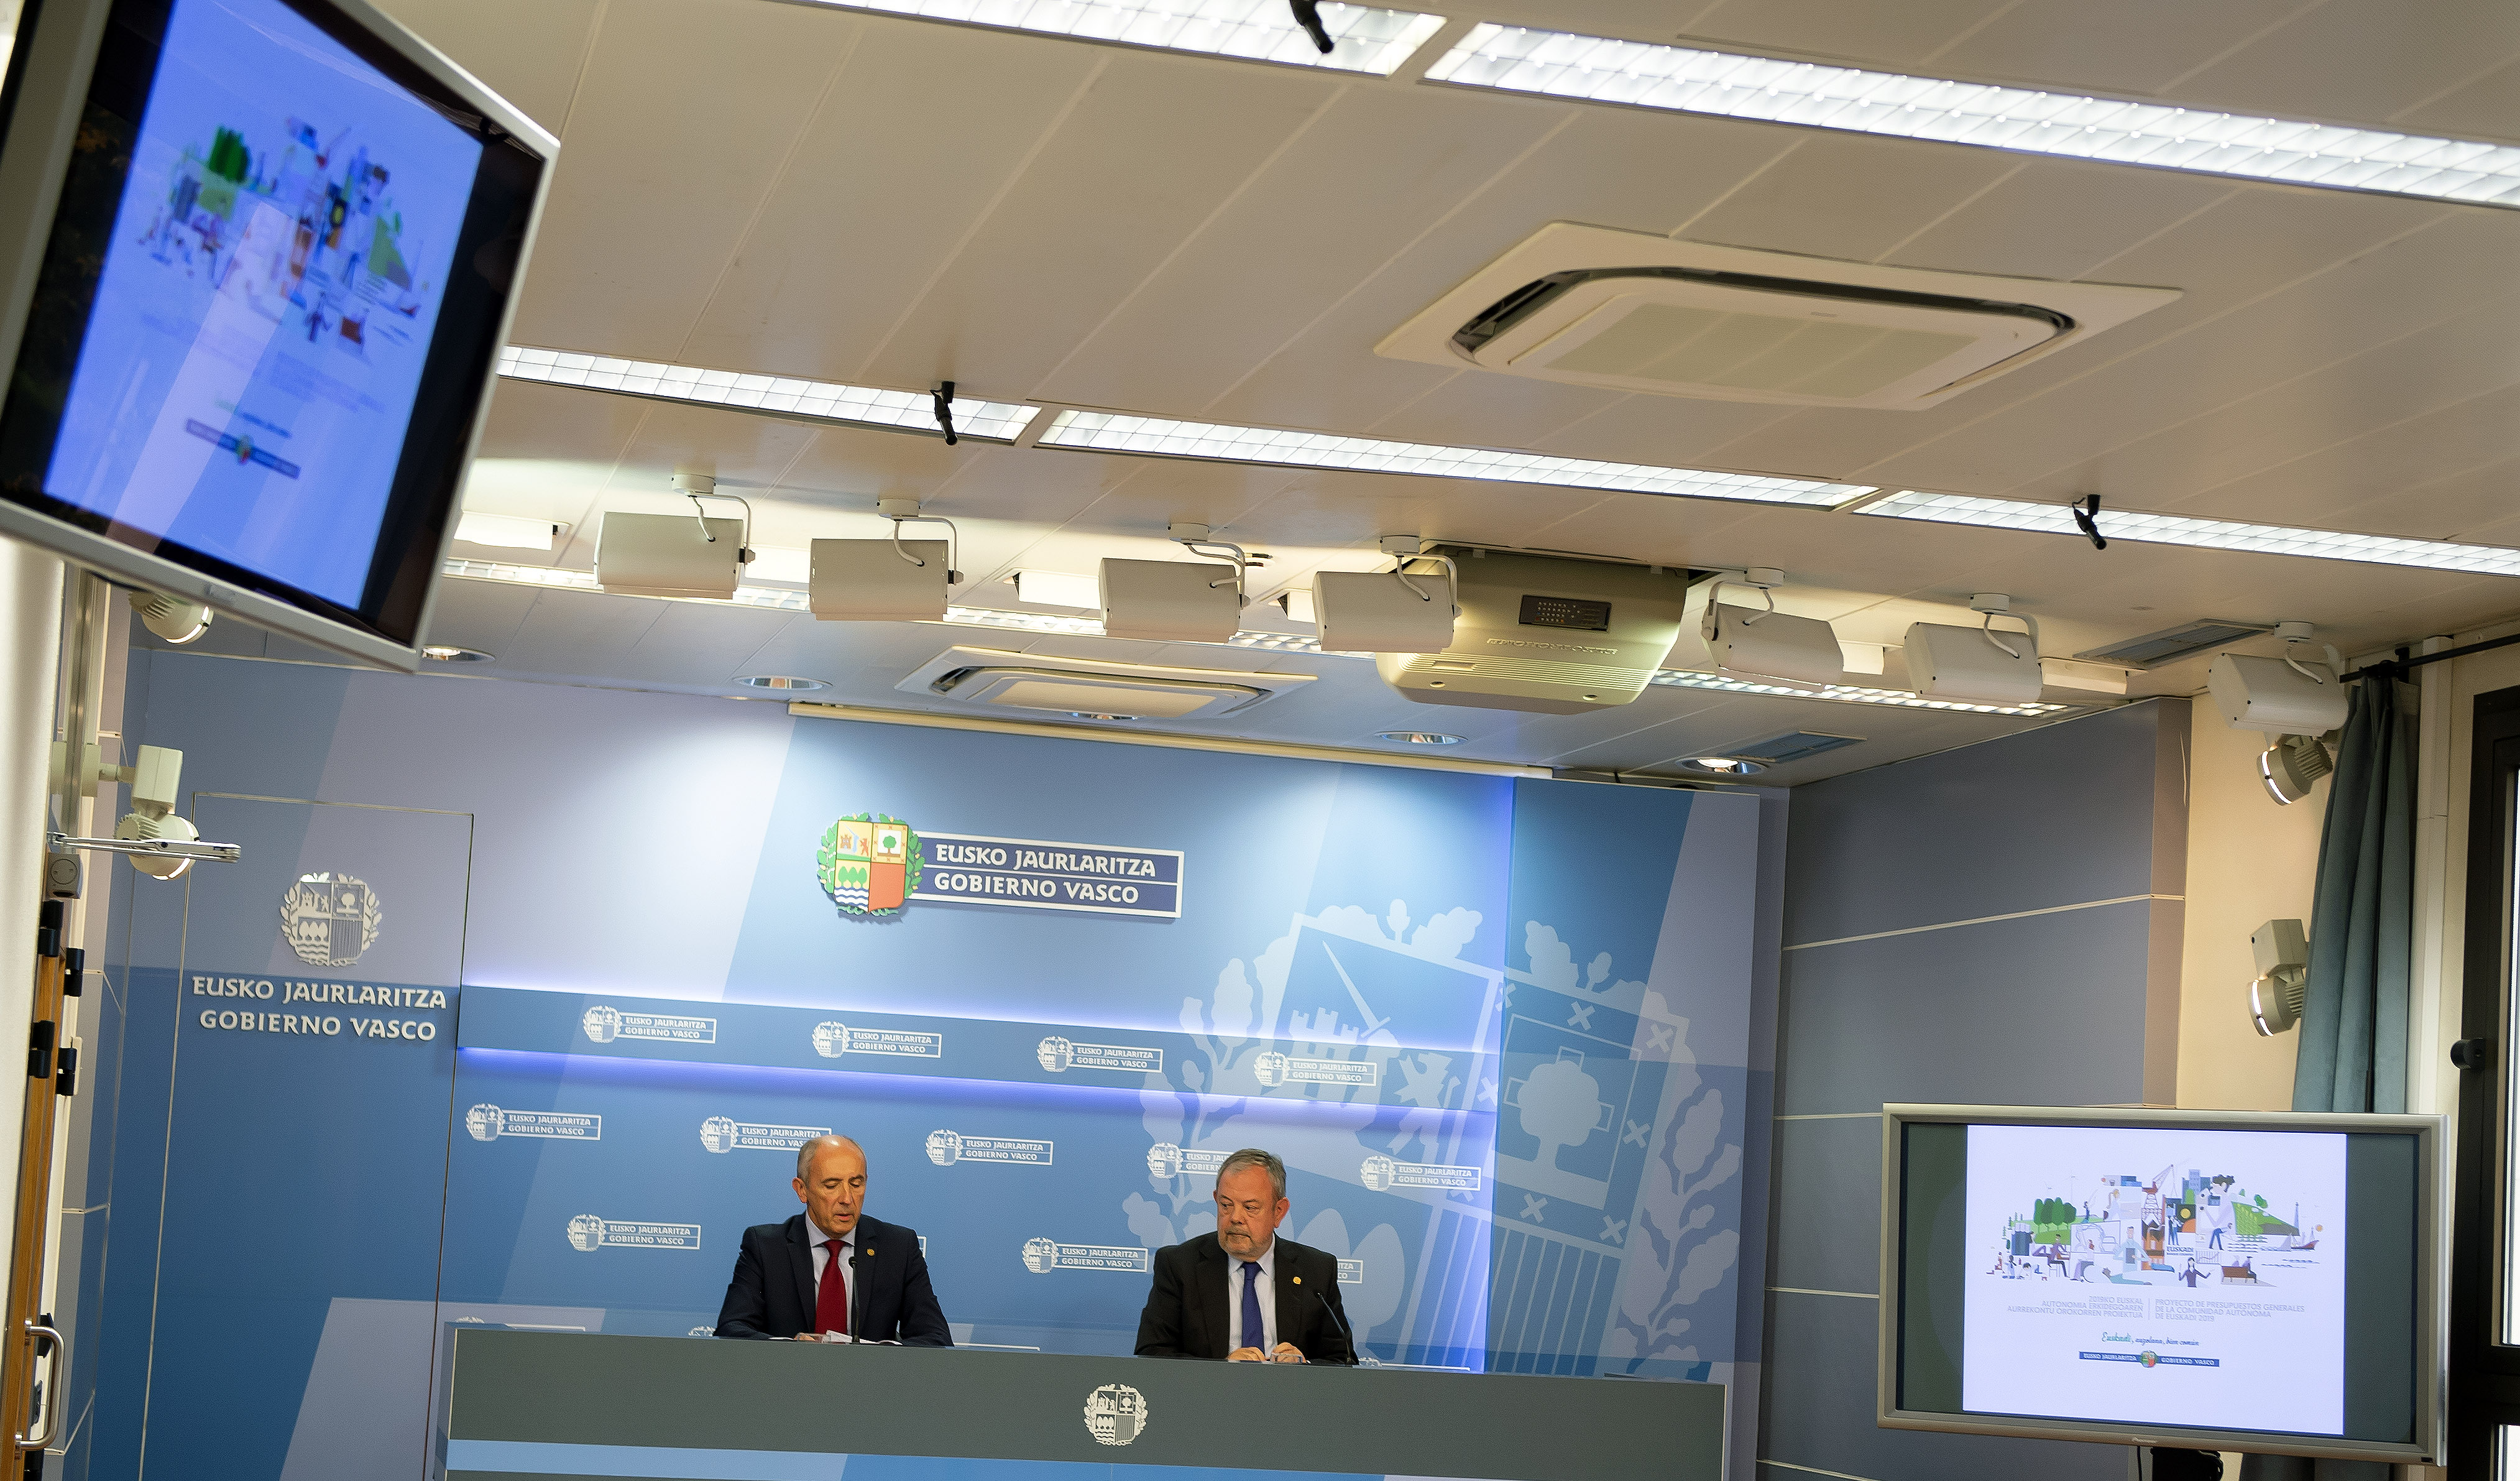 2018_10_23_consejo_gobierno_03.jpg